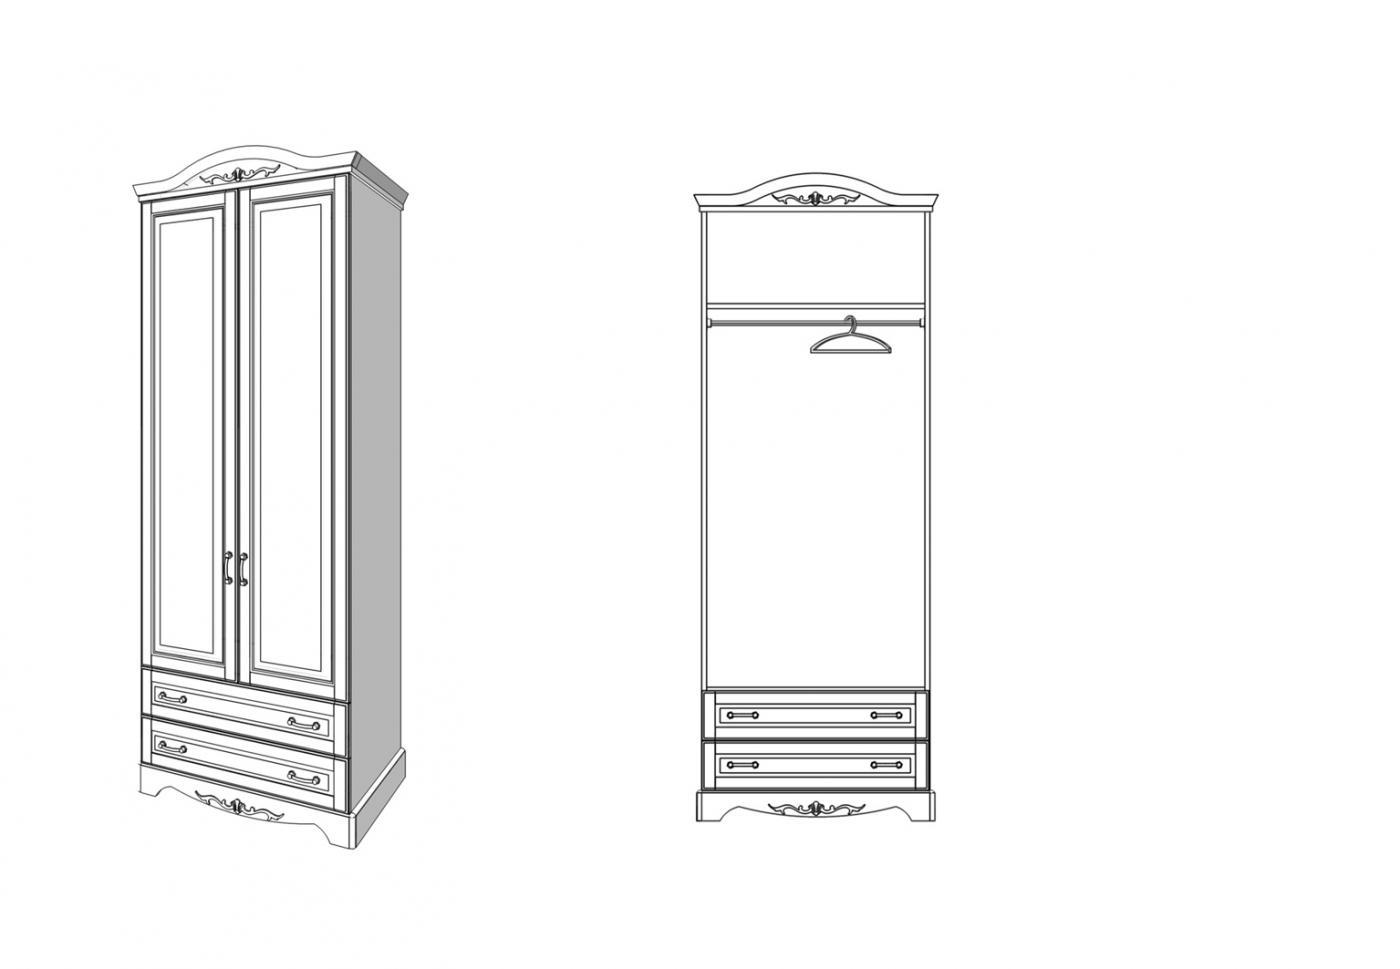 Шкаф Прованс 2 двери 2 ящика2